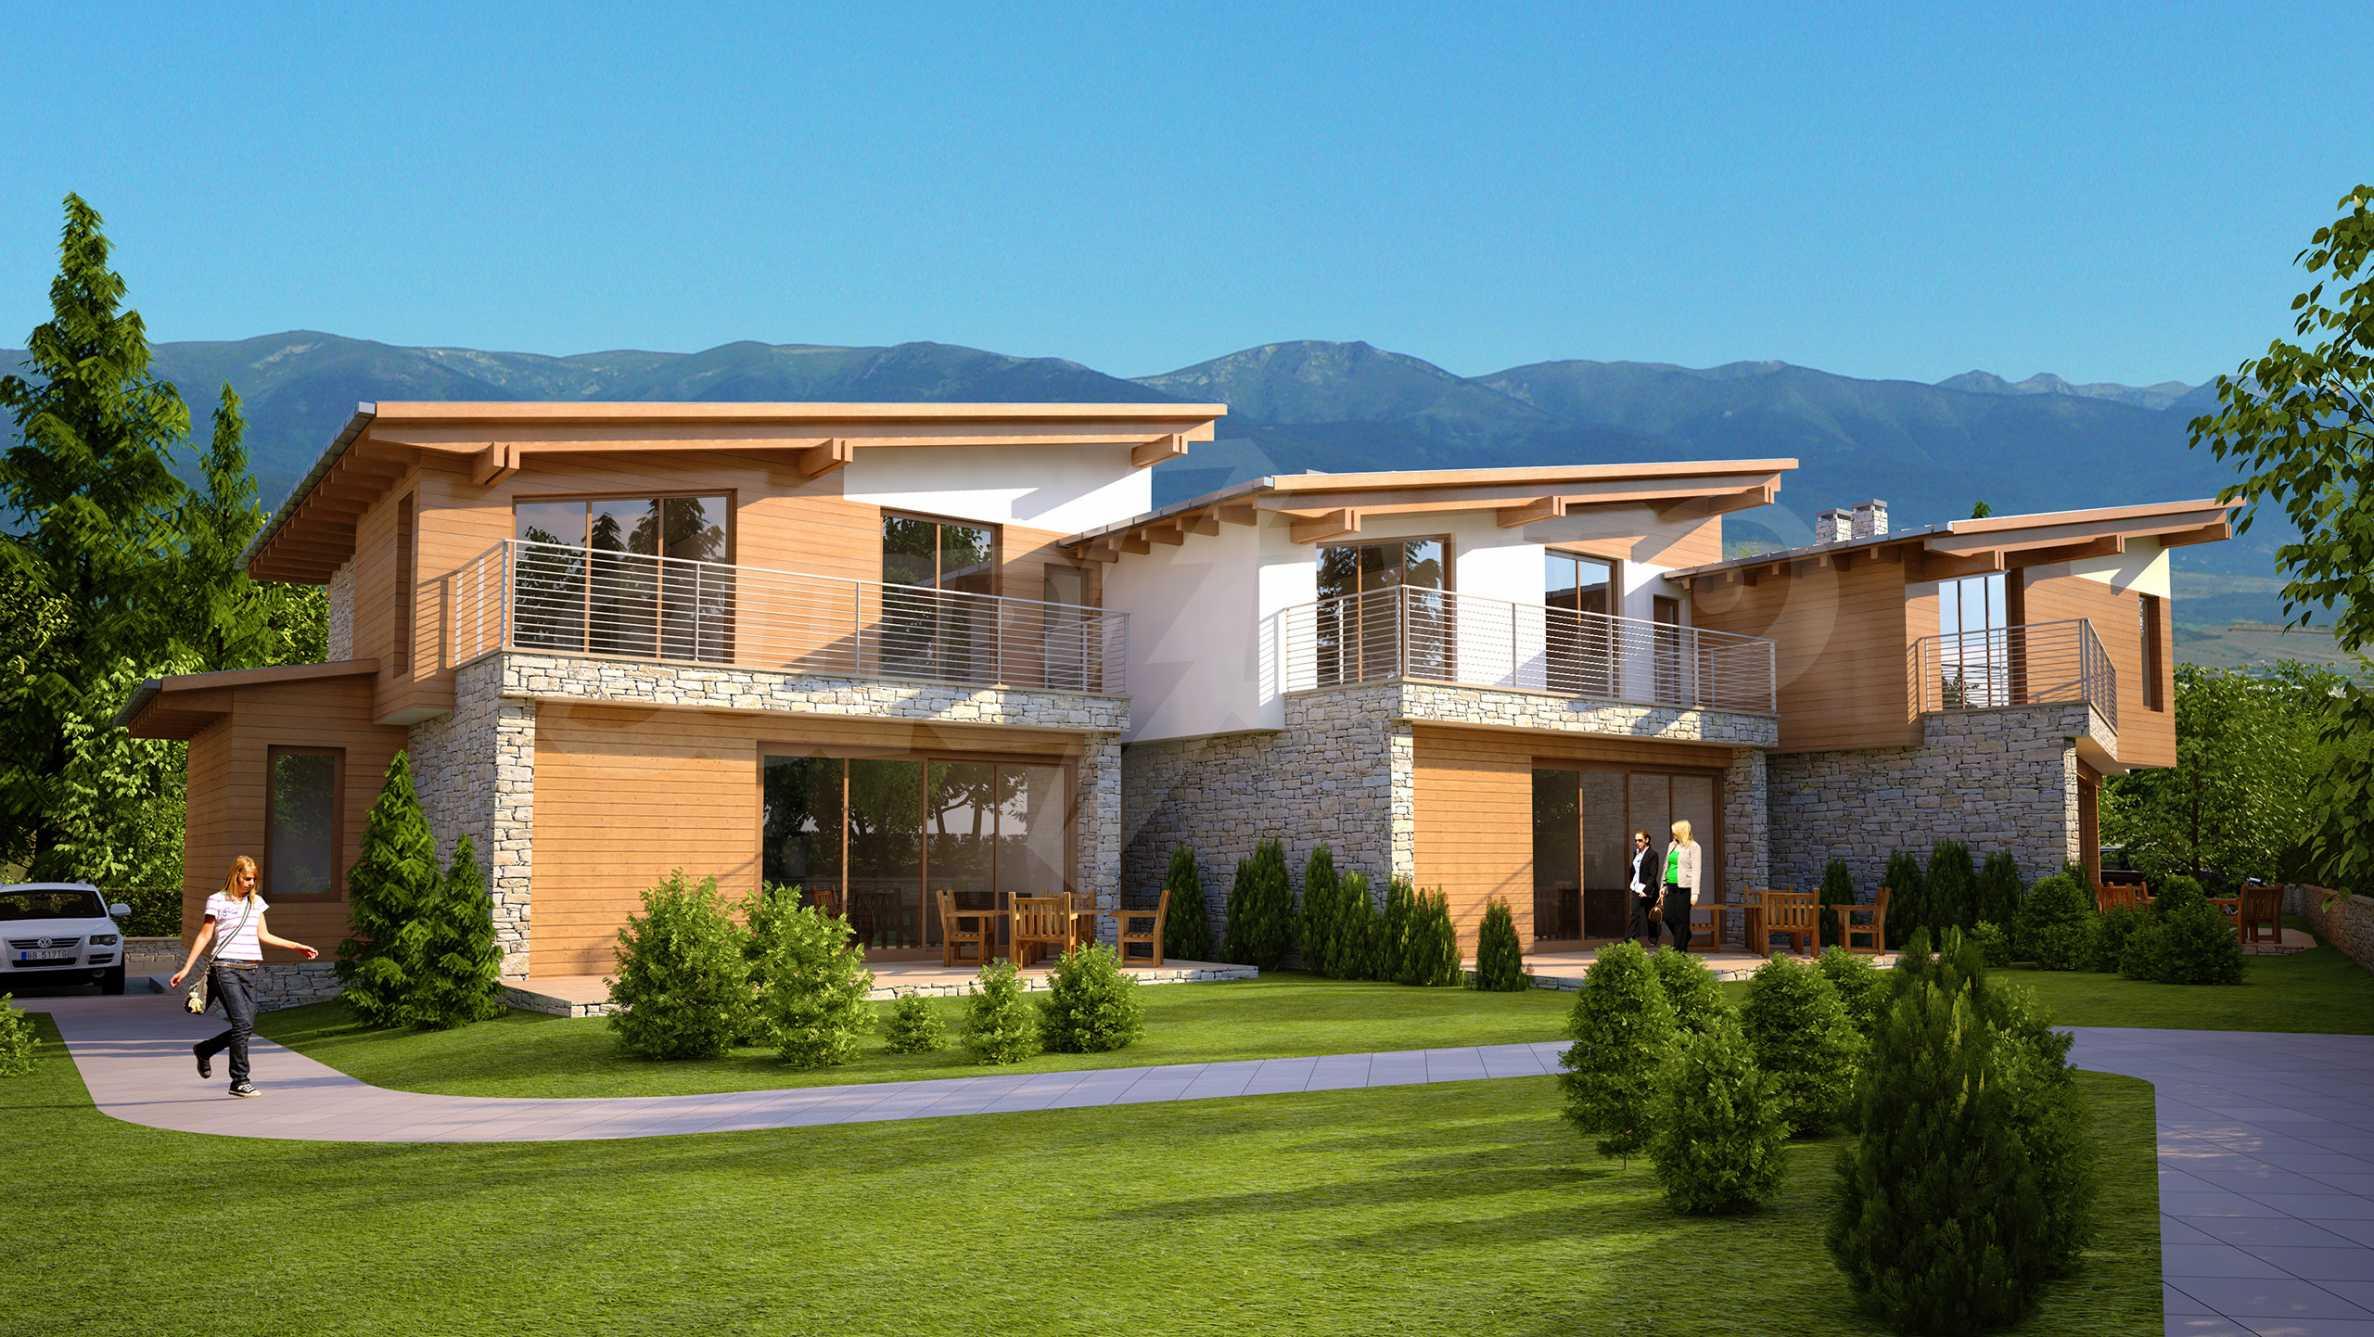 House for sale in Bansko, Bulgaria - Alpina Chalets complex near the Gondola.